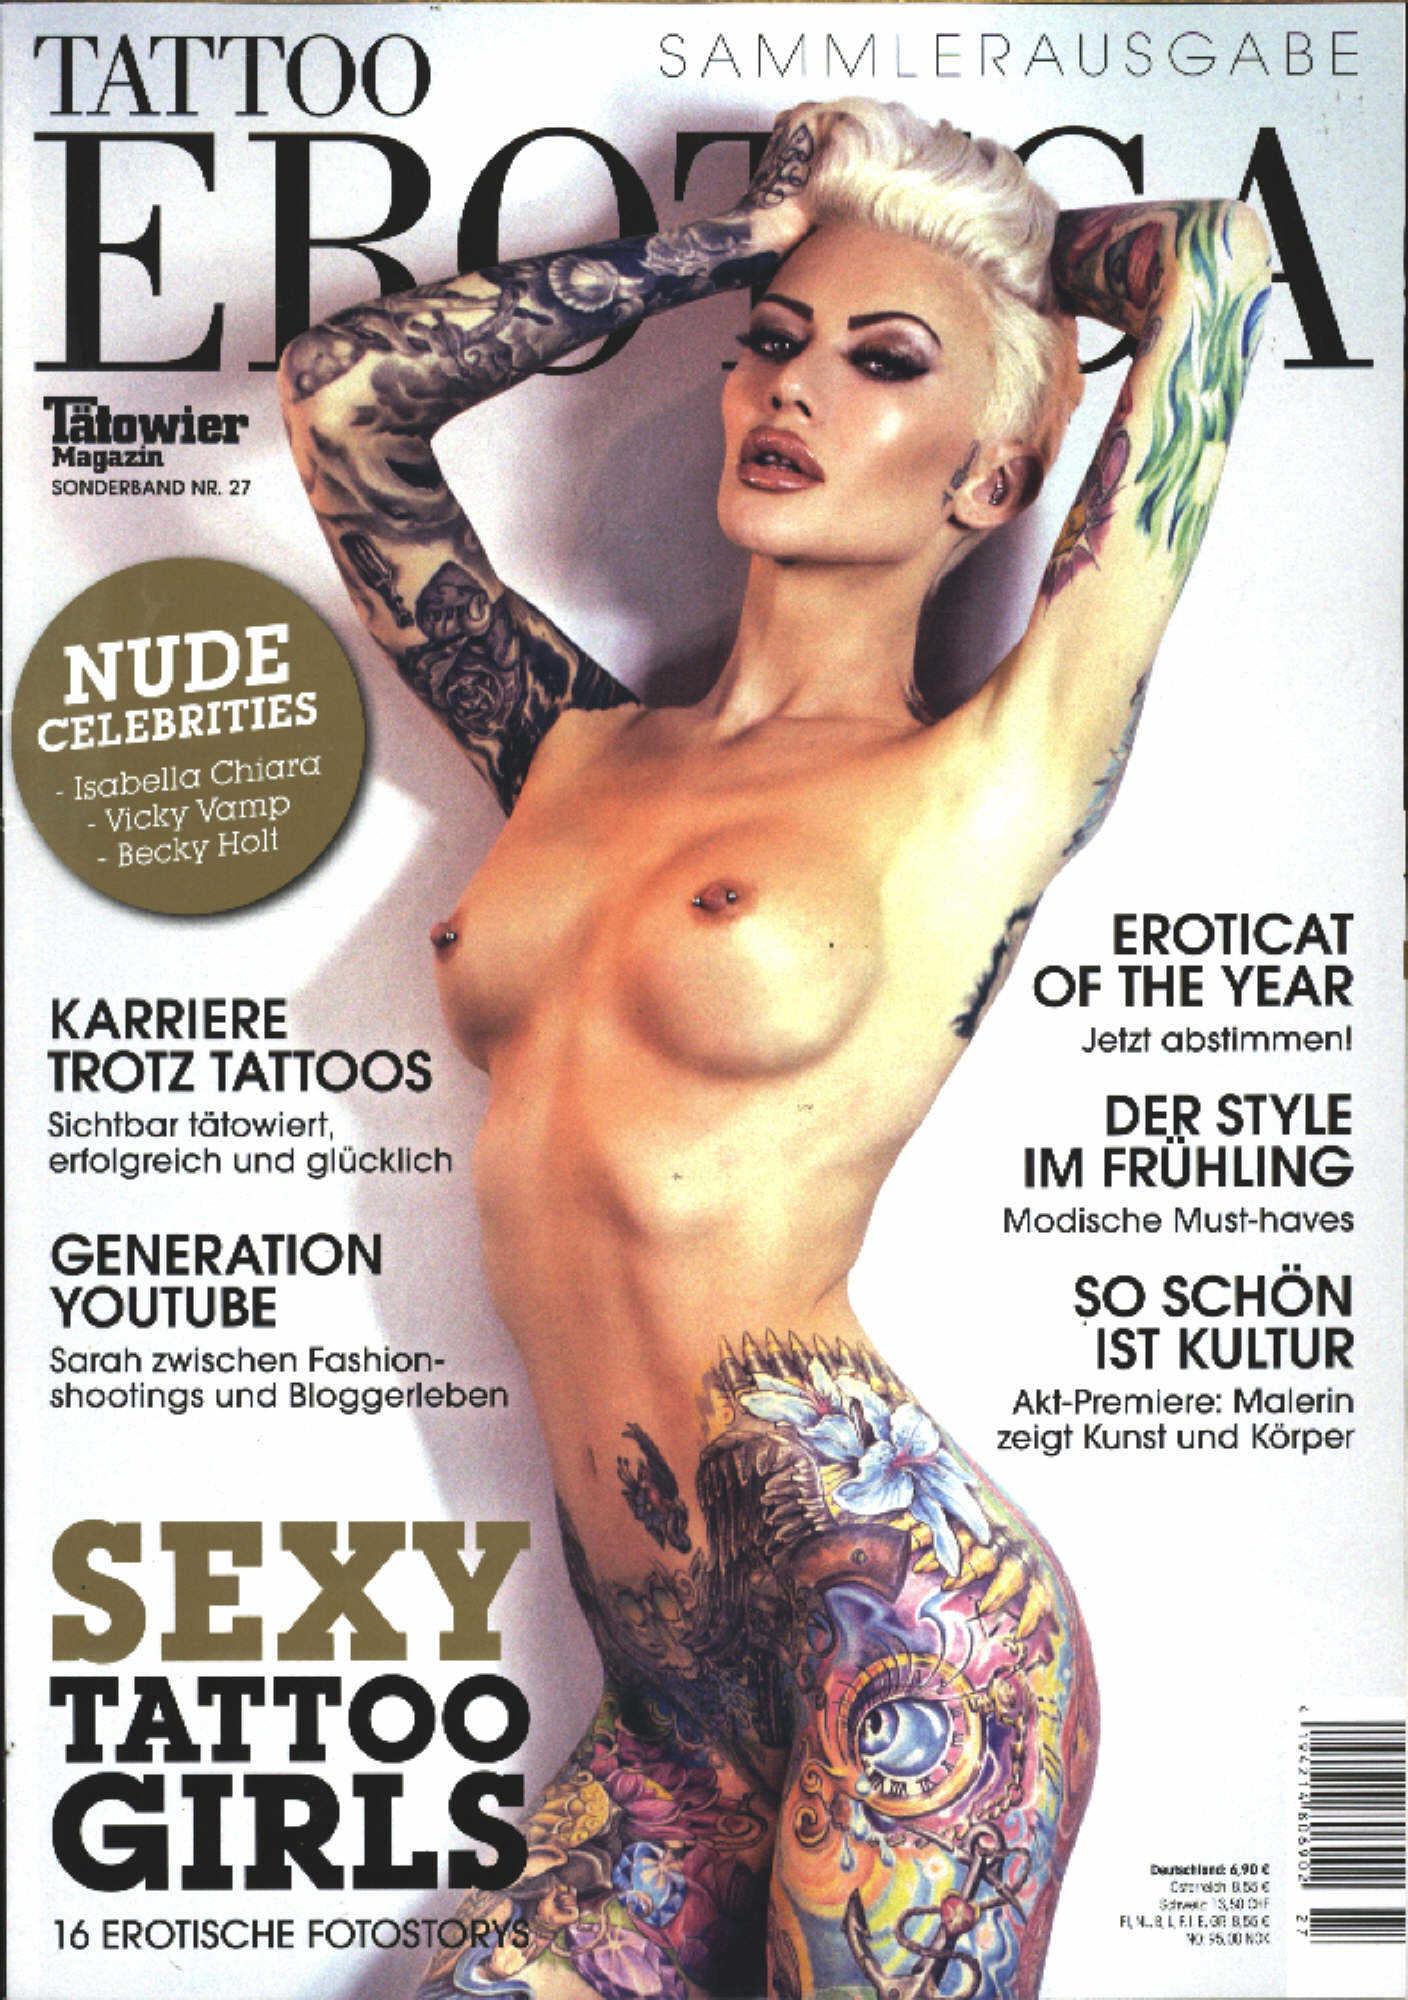 erotische fotostory cuckold videos